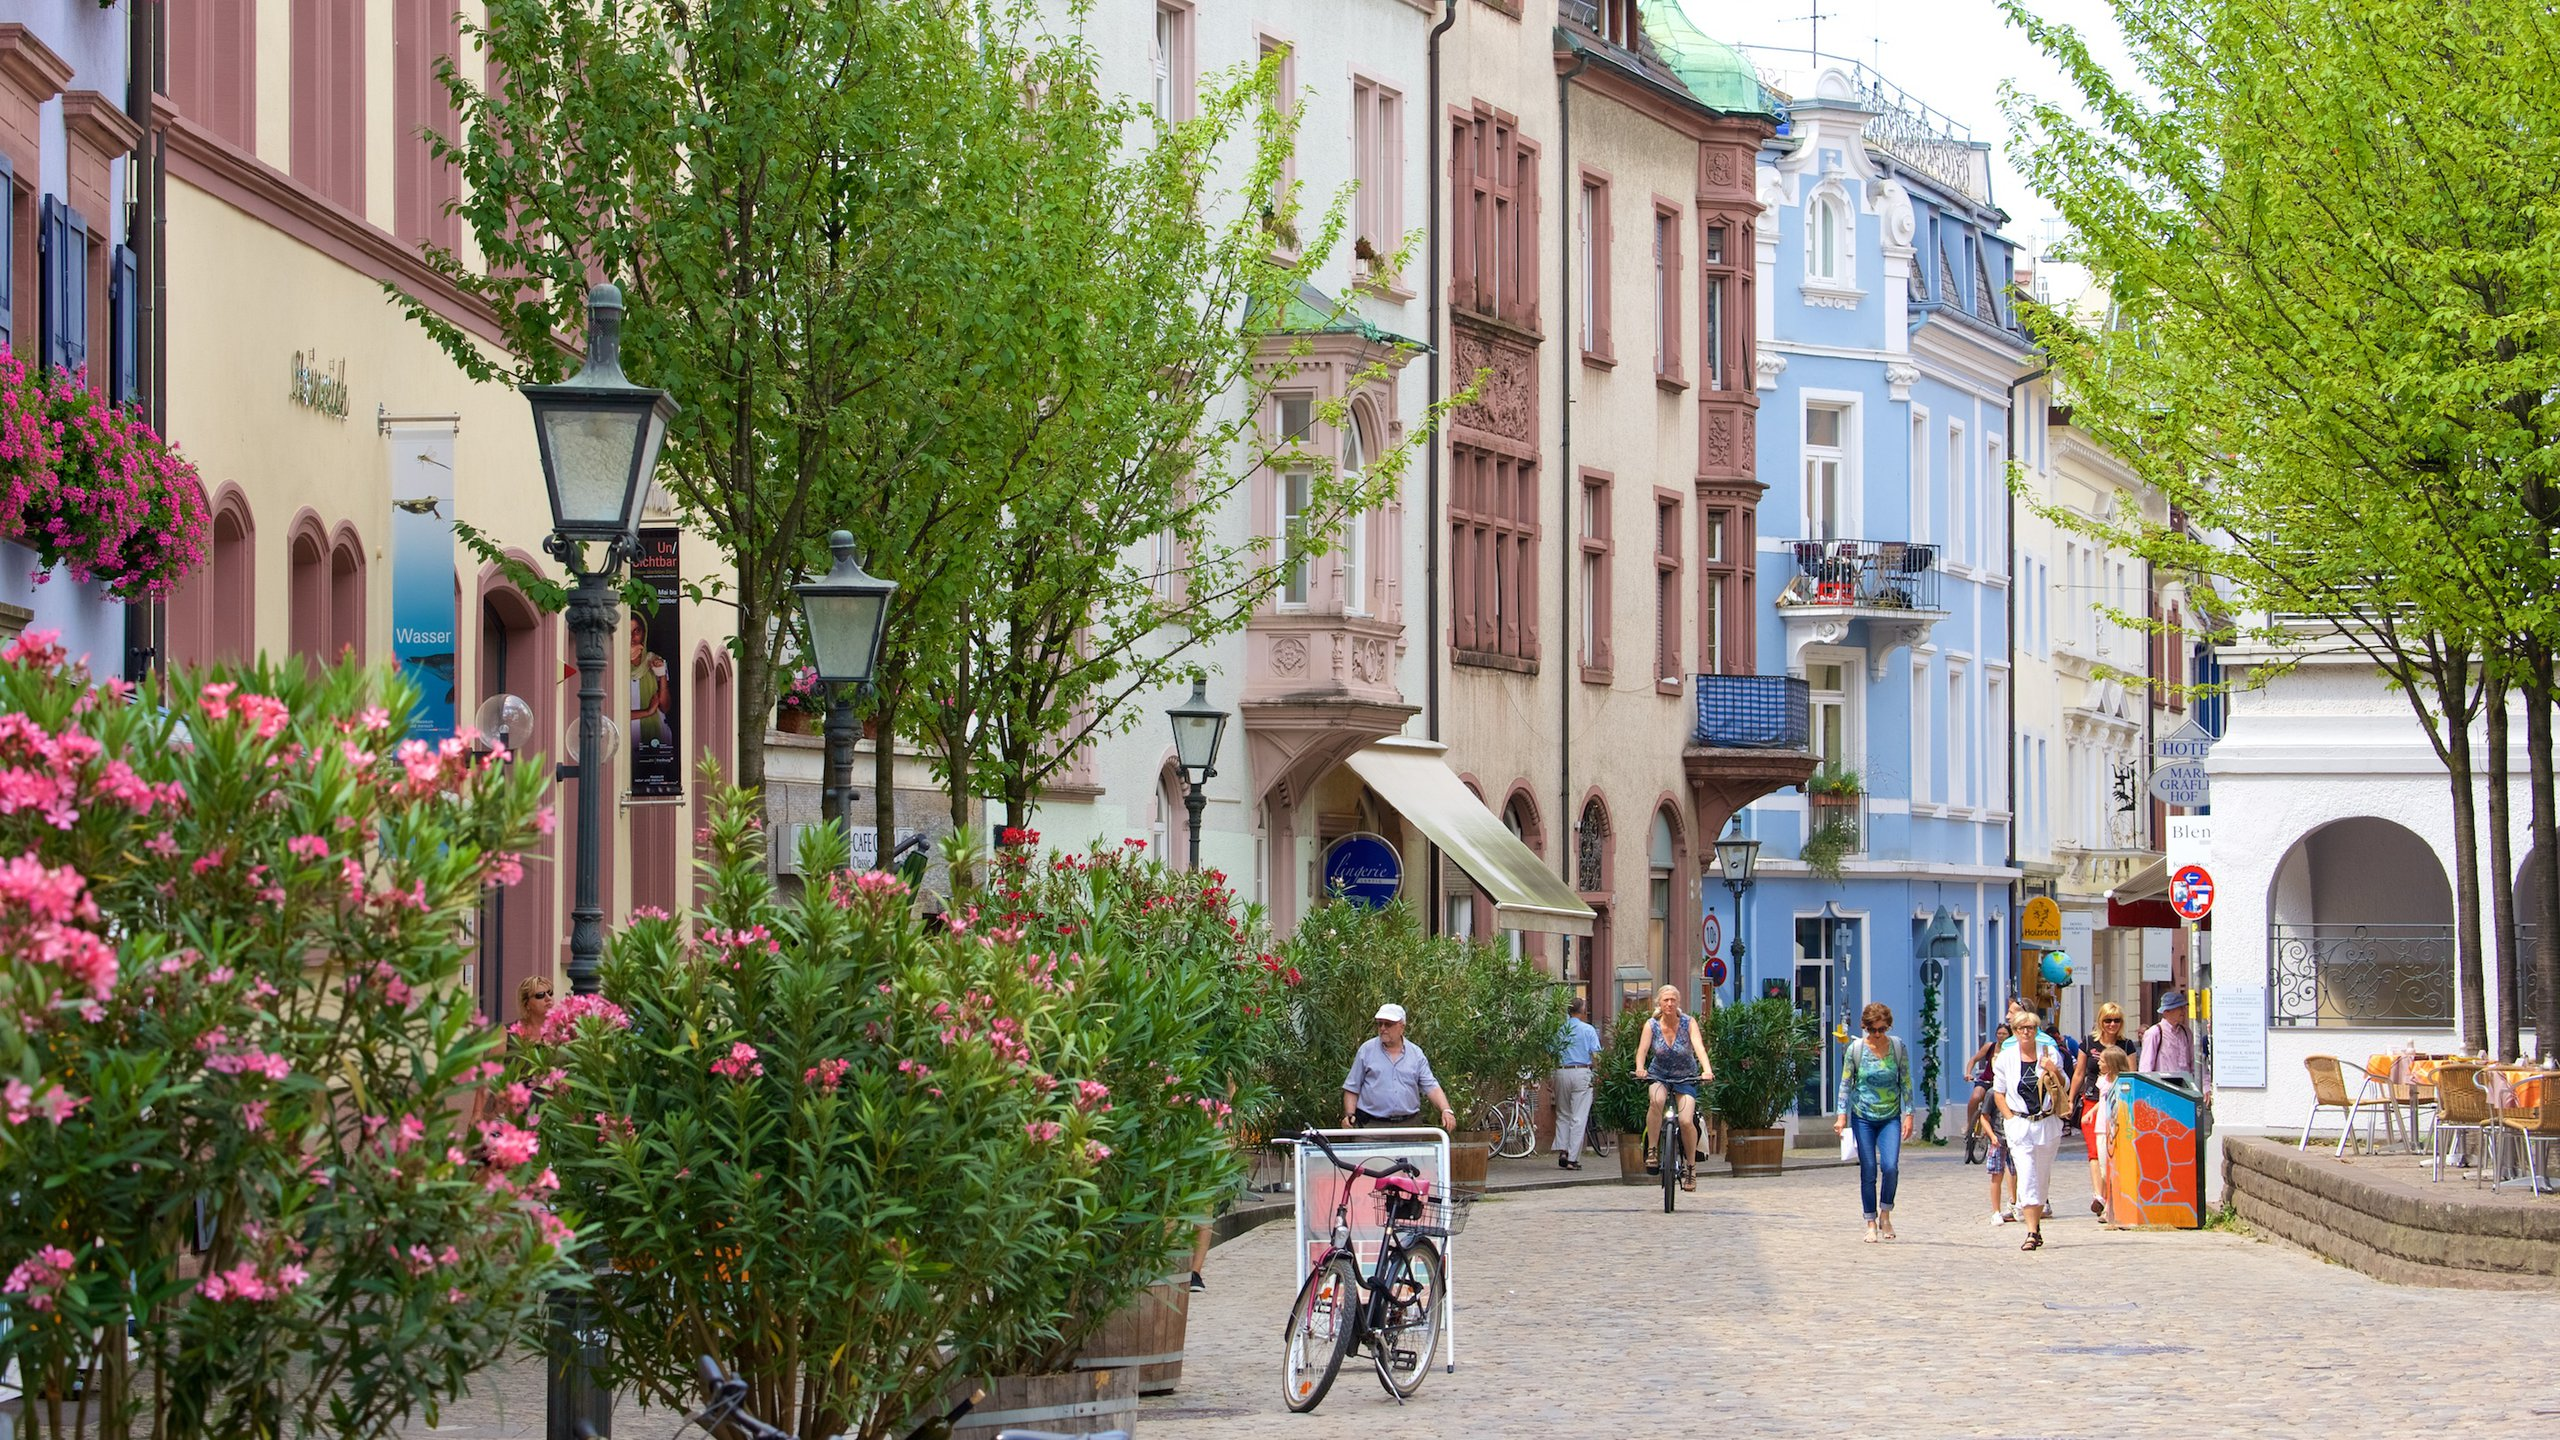 Freiburg which includes street scenes